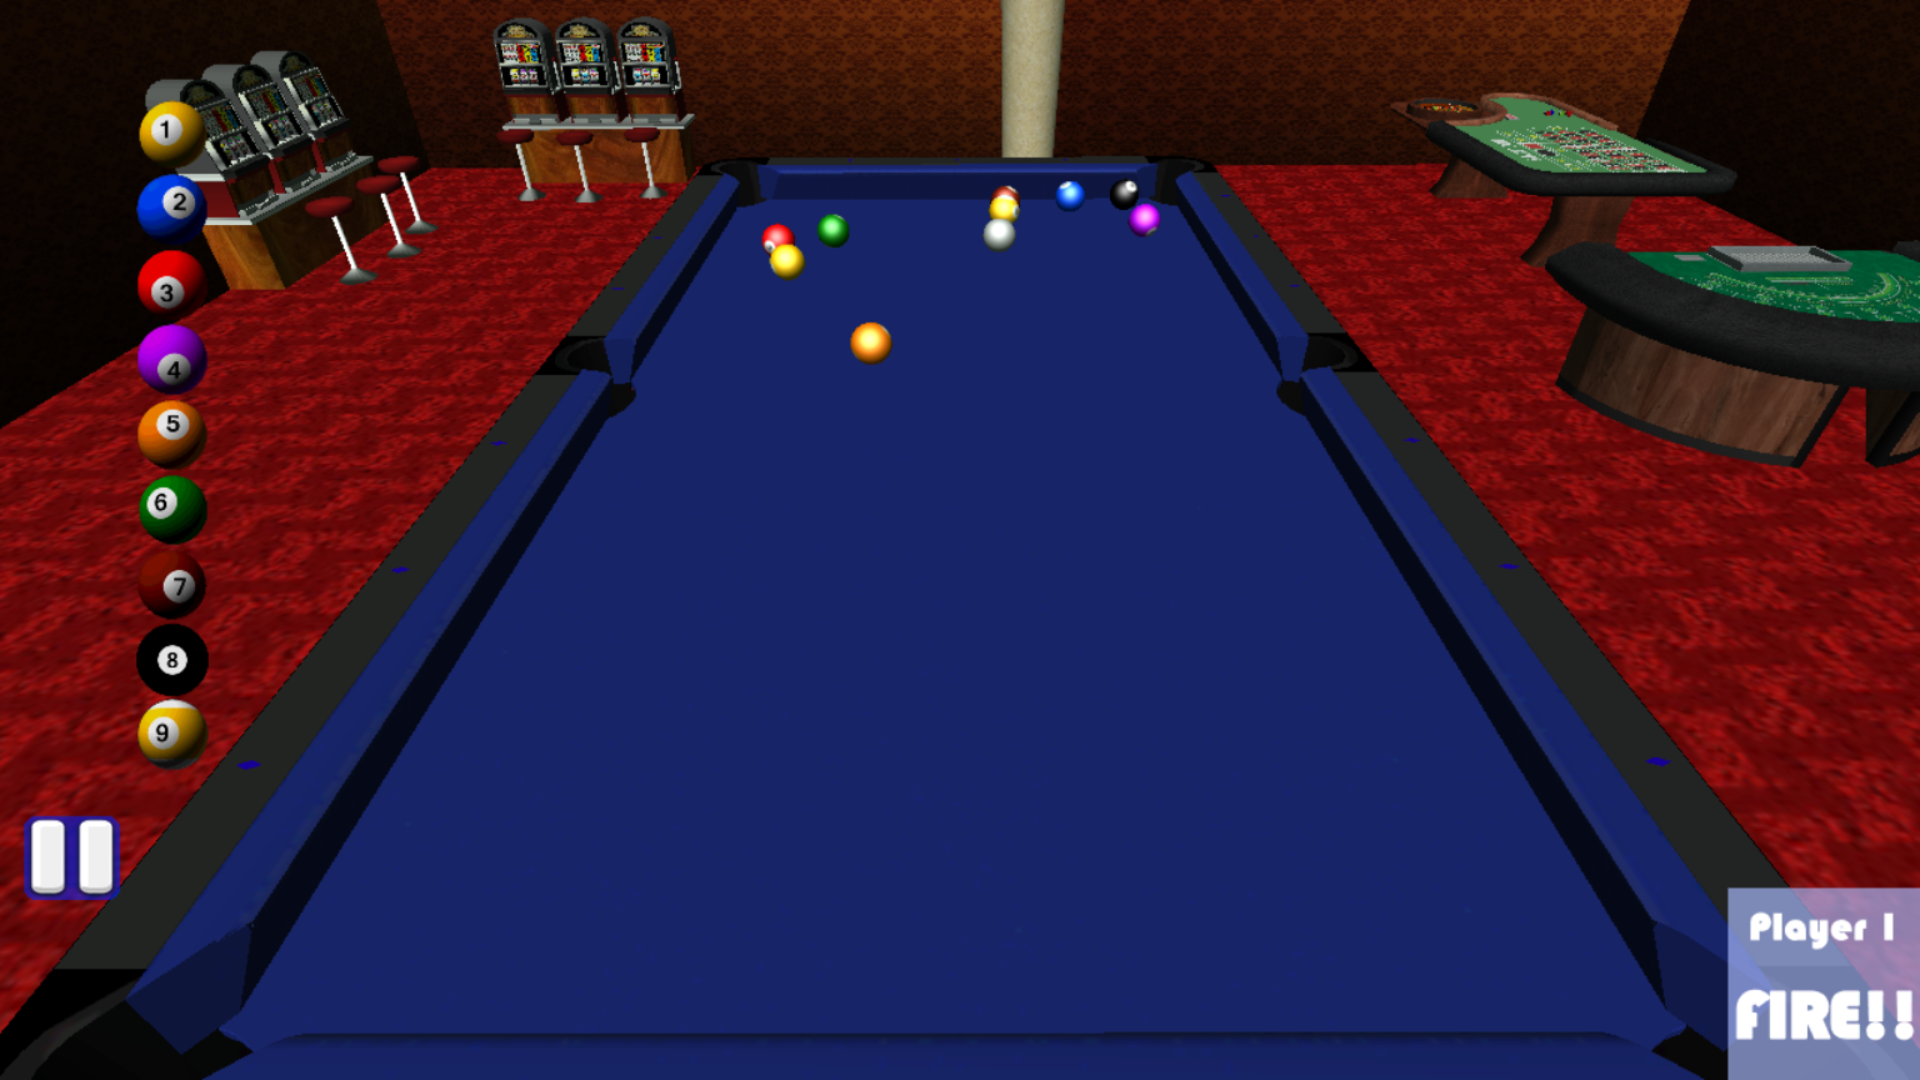 3D Pool Billiards Master Multiplayer Offline: Amazon.es: Appstore ...